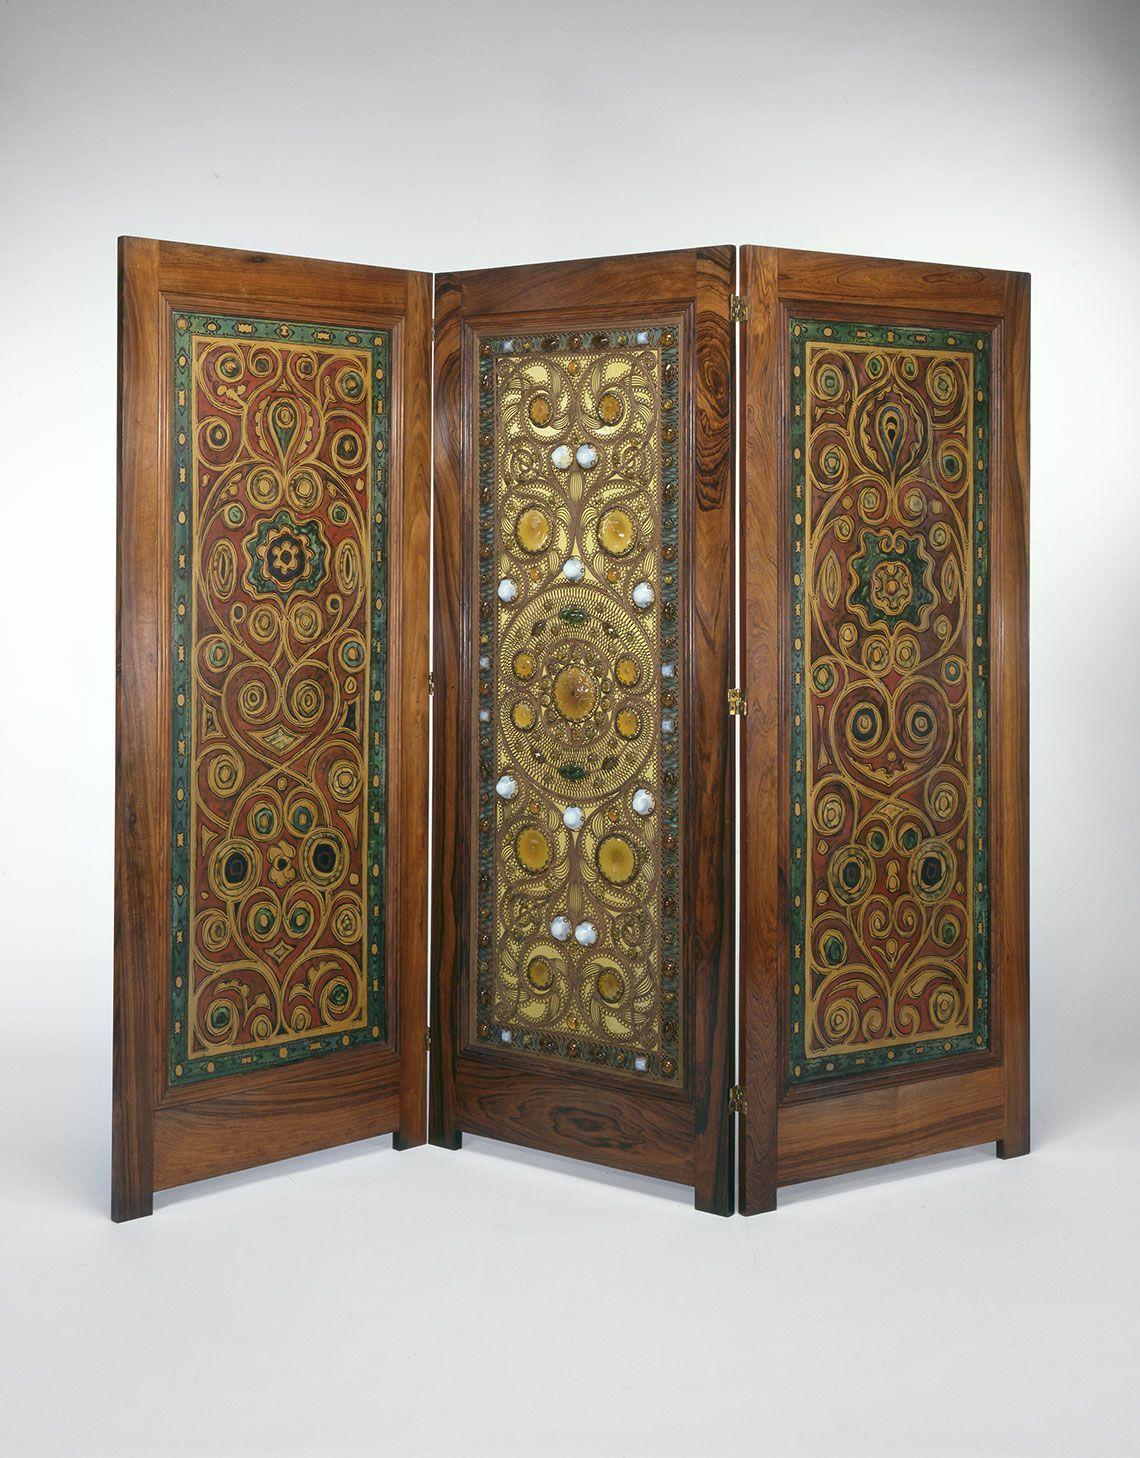 Tri Fold Screen By Louis C Tiffany And Company Ca 1881 Art Nouveau Furniture Victorian Furniture Louis Comfort Tiffany